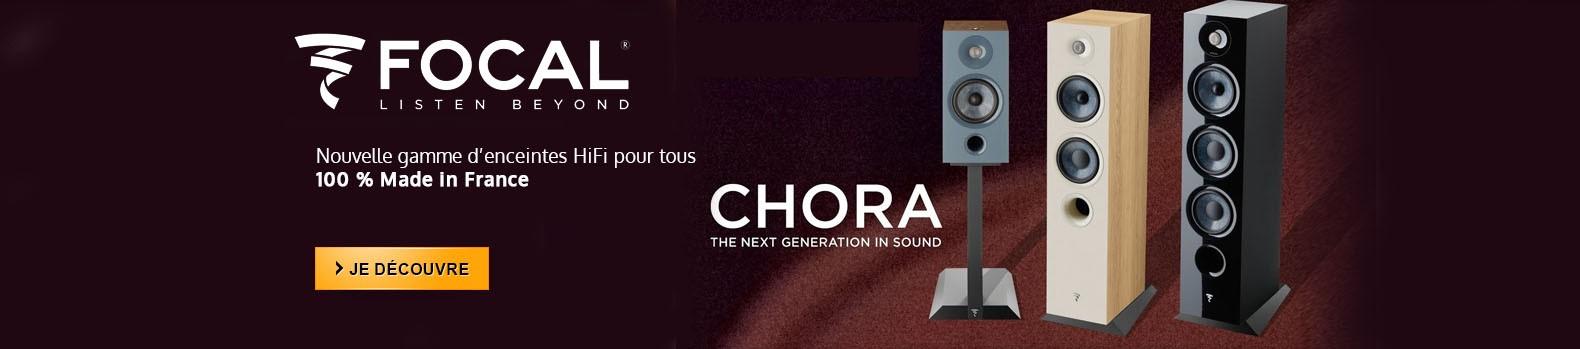 Nouvelles enceintes Focal Chora 100% made in France